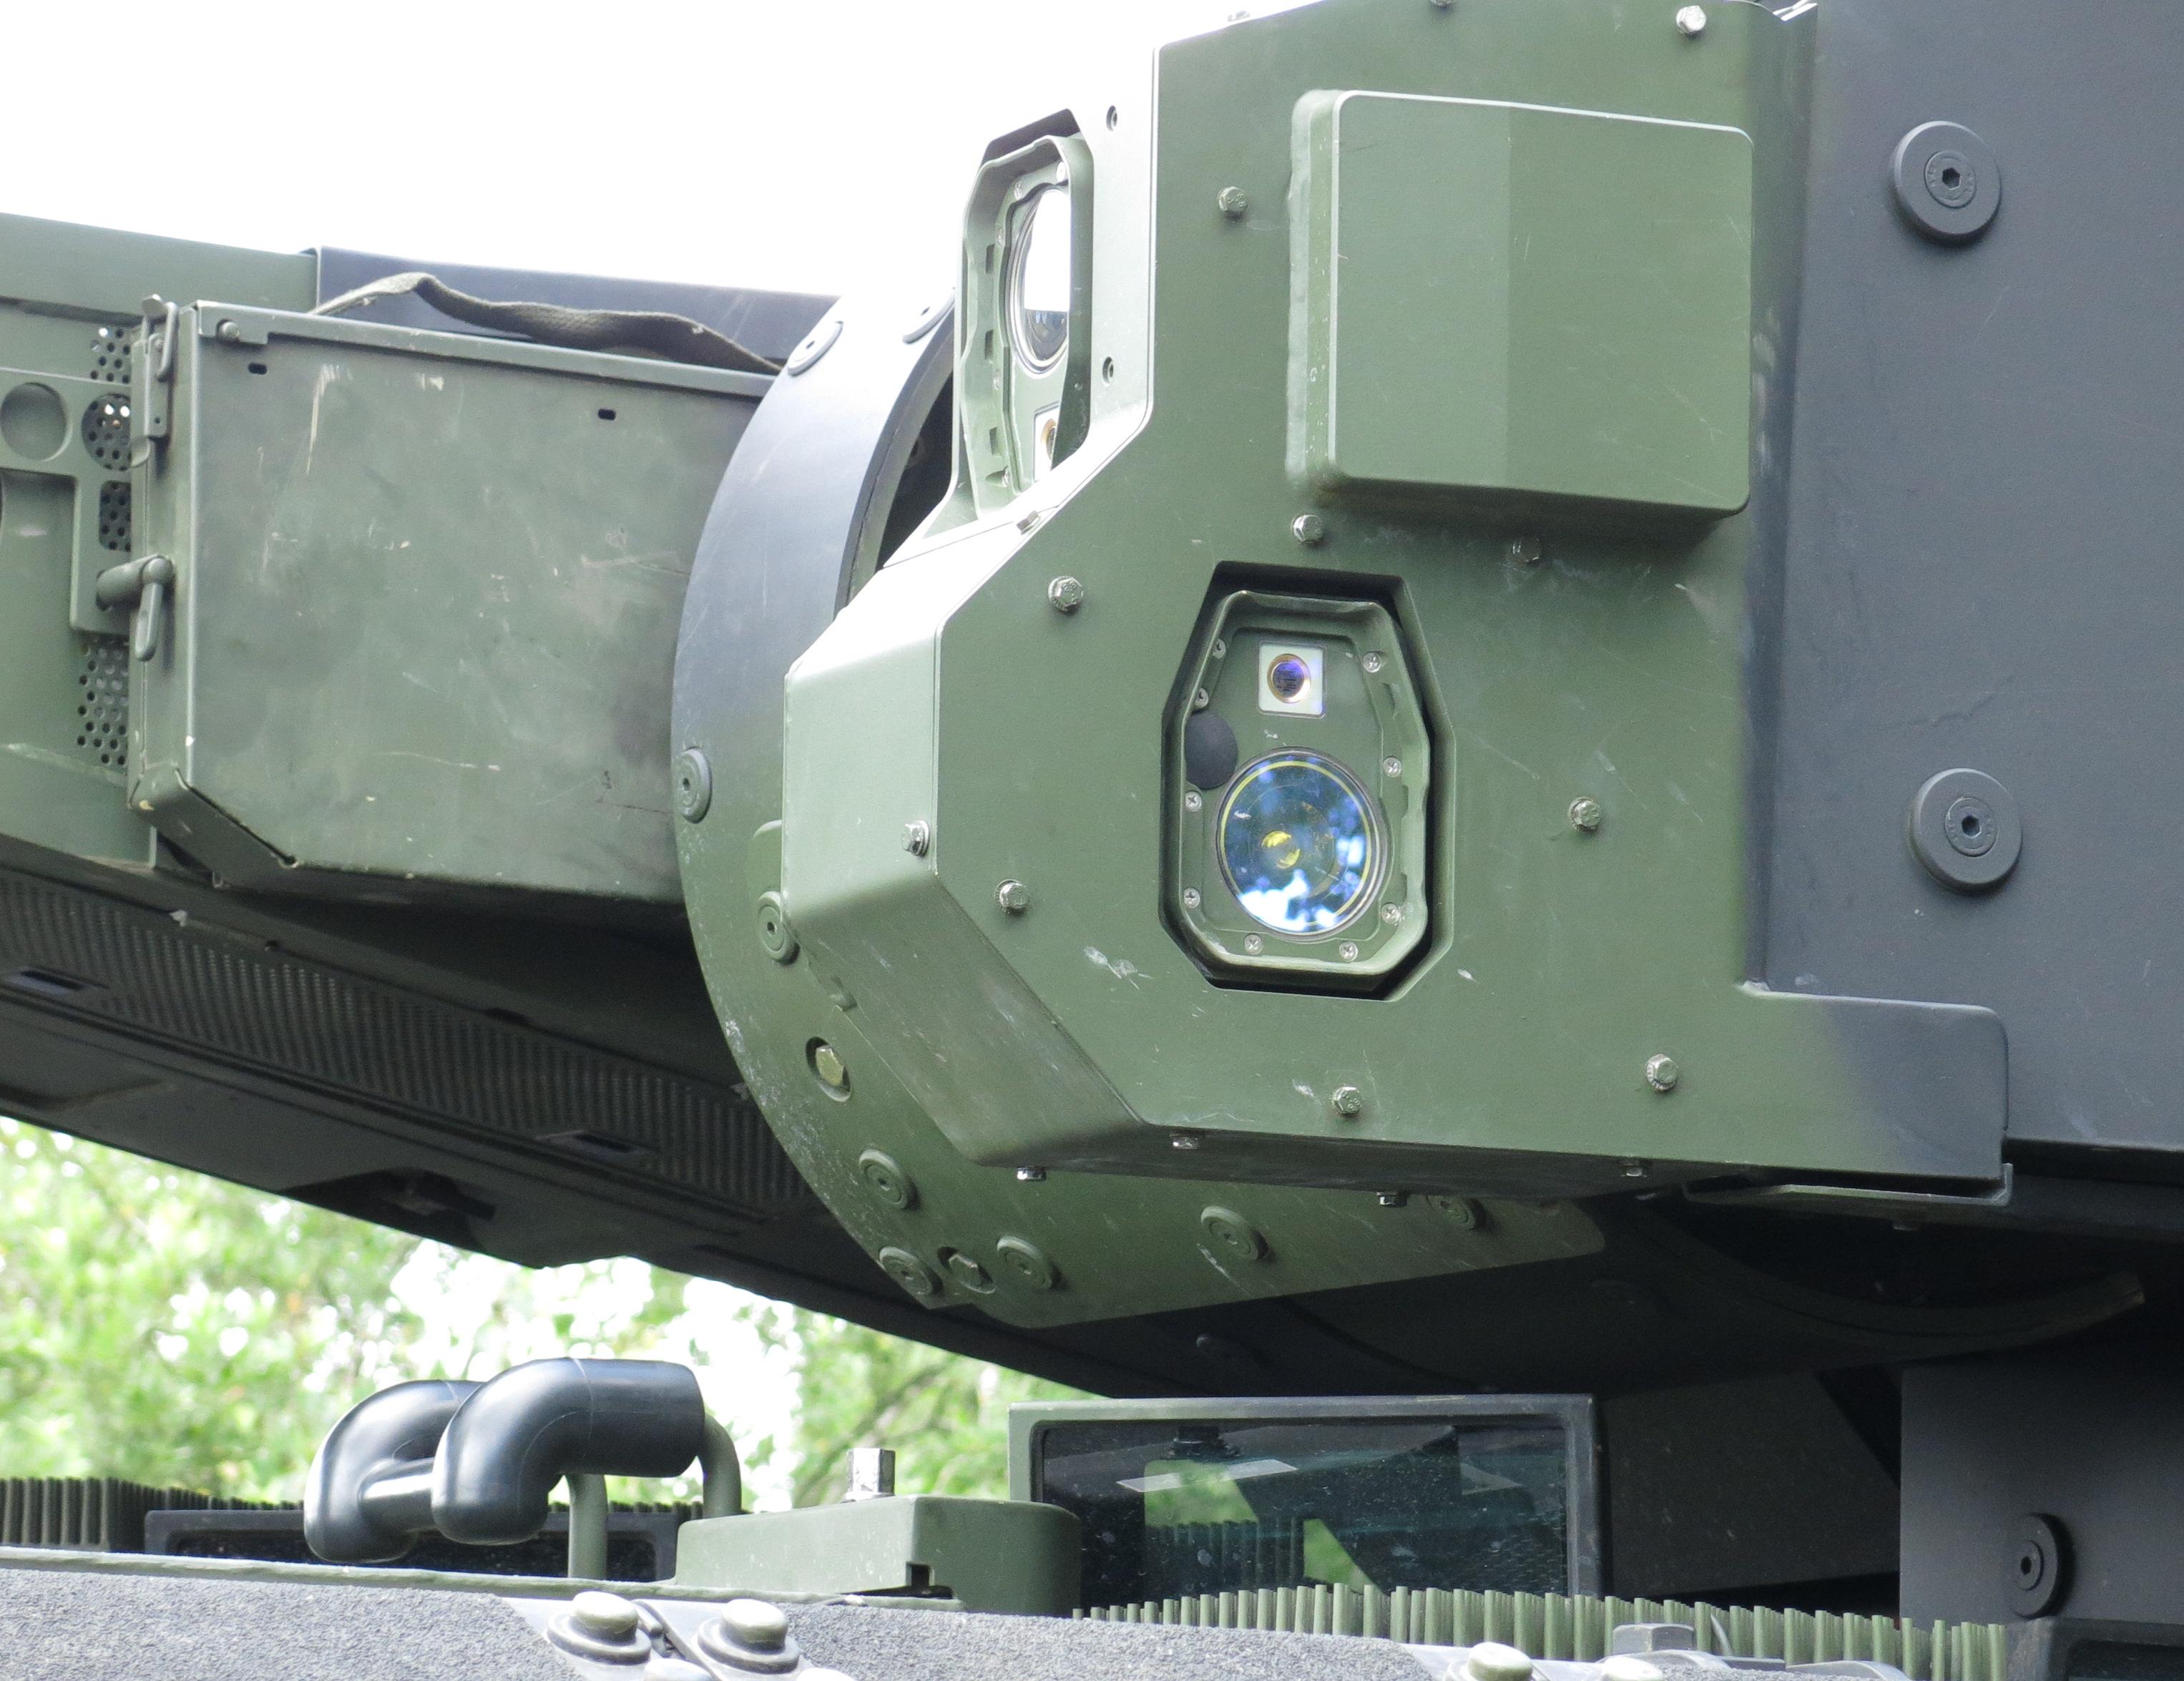 https://upload.wikimedia.org/wikipedia/commons/3/3e/MUSS_sensors_on_Puma_IFV_turret.JPG